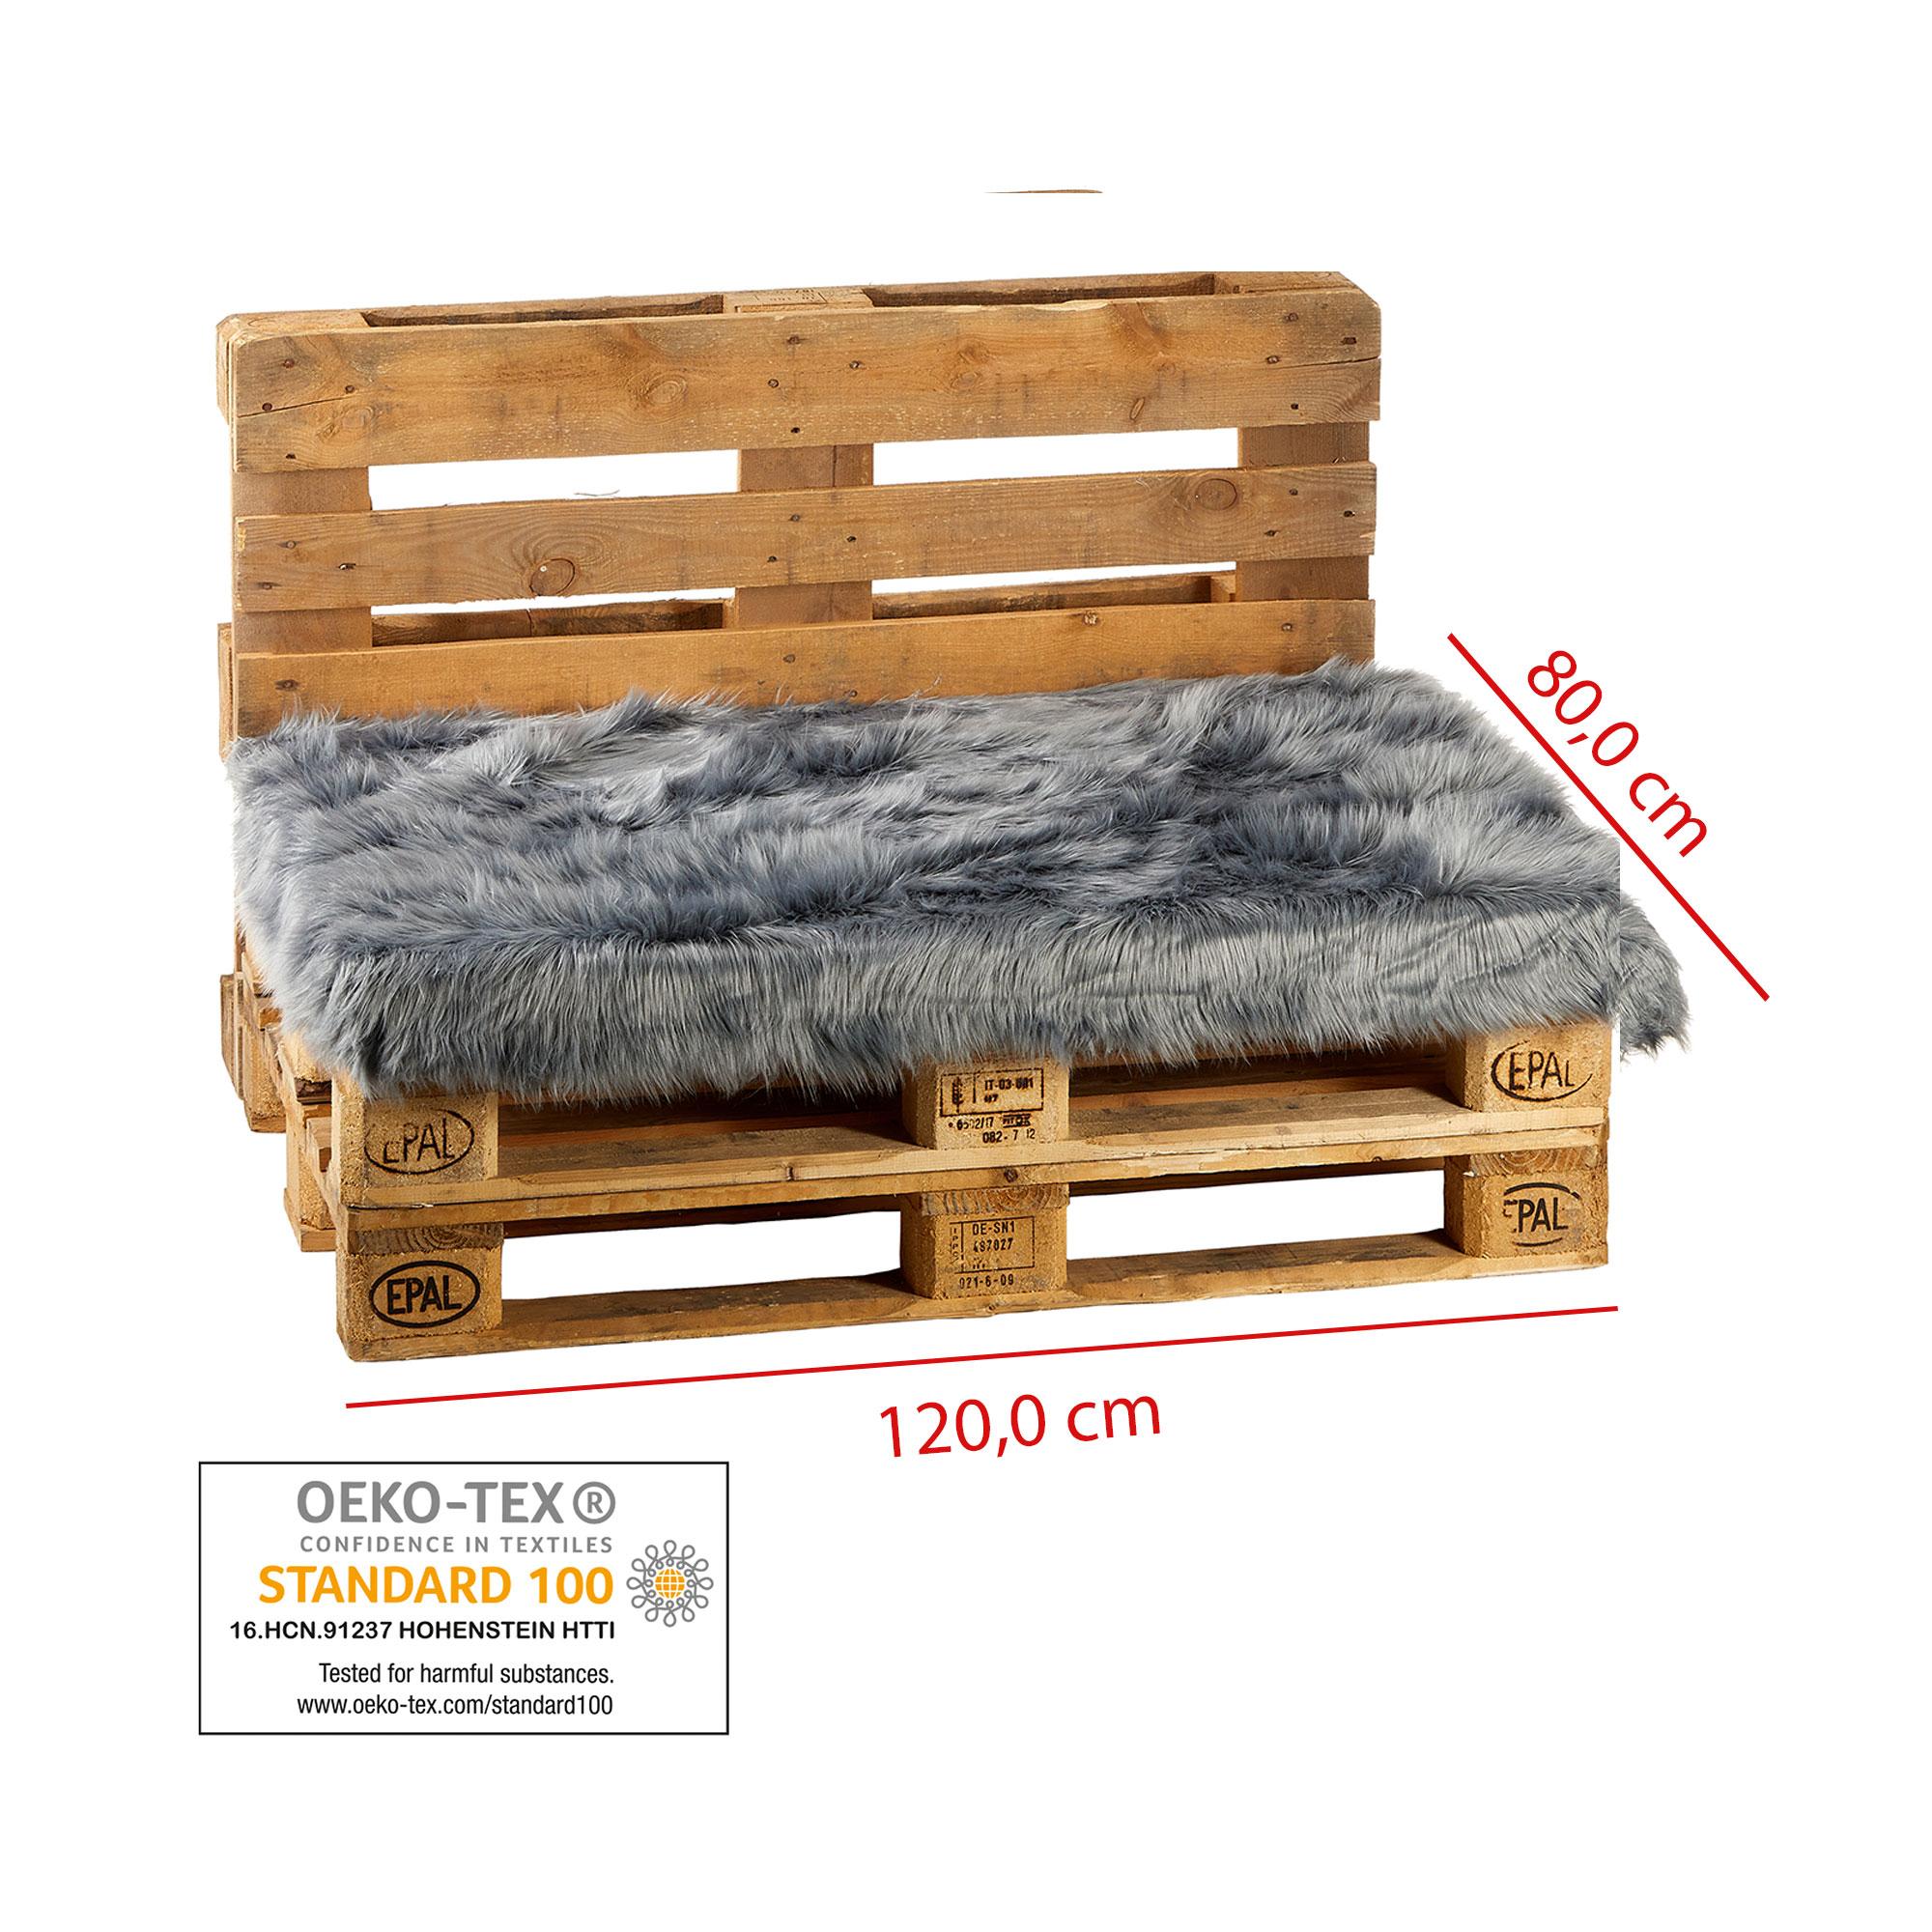 Indexbild 2 - Palettenkissen Sitzauflage Kissen Paletten Sofa Möbel Fell-Optik 80x120cm Grau